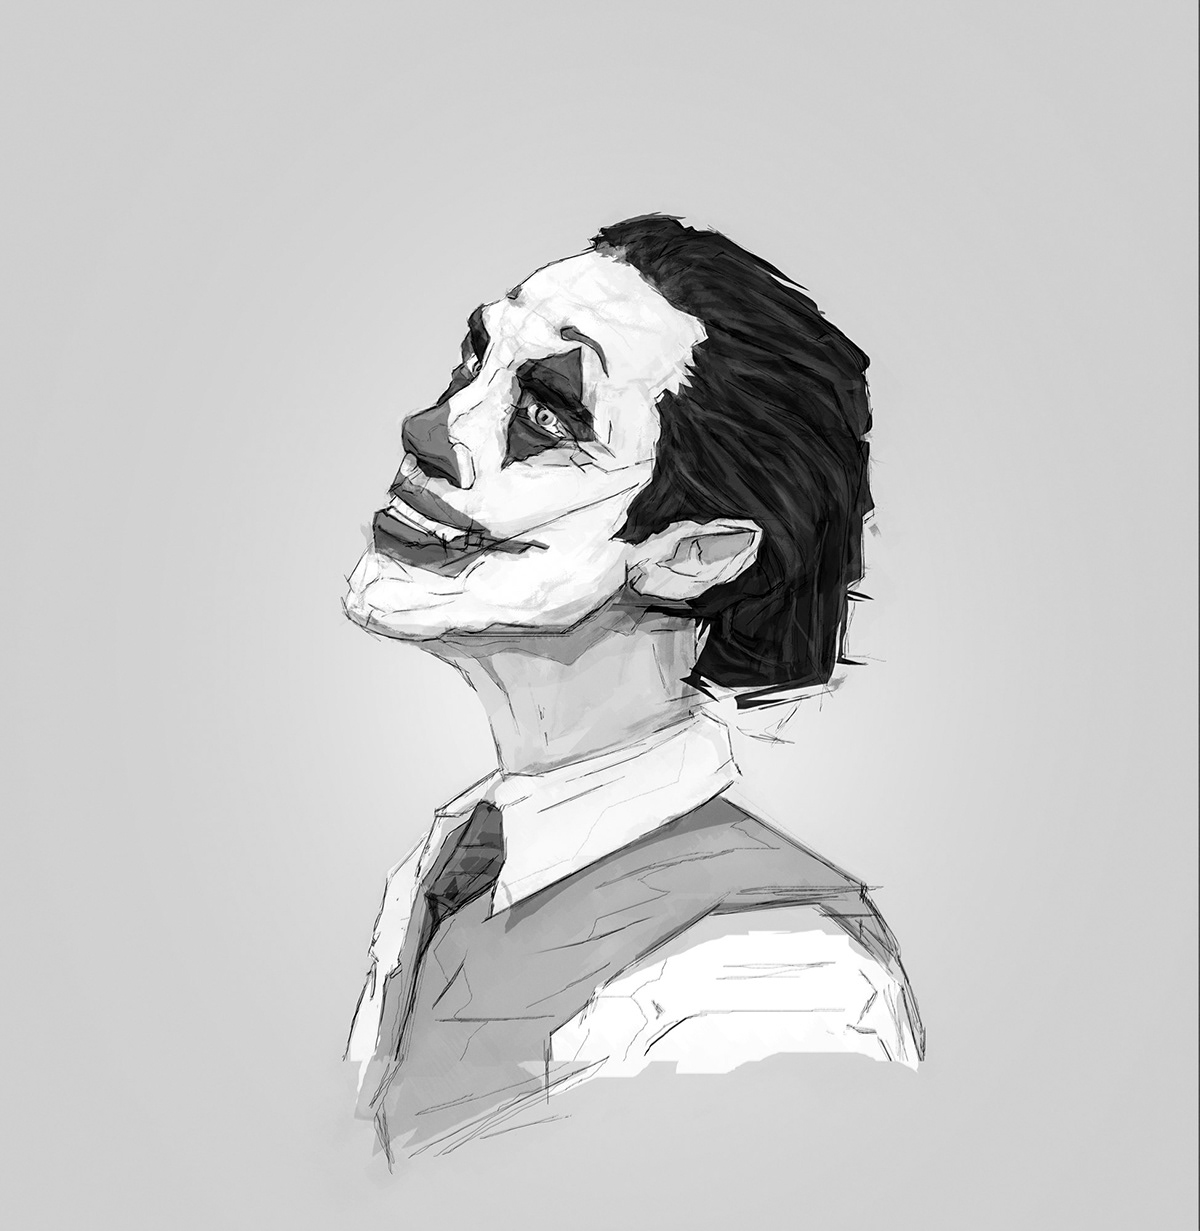 crazy Digital Art  Drawing  franko schiermeyer ILLUSTRATION  joaquin phoenix joker movie movie poster portrait